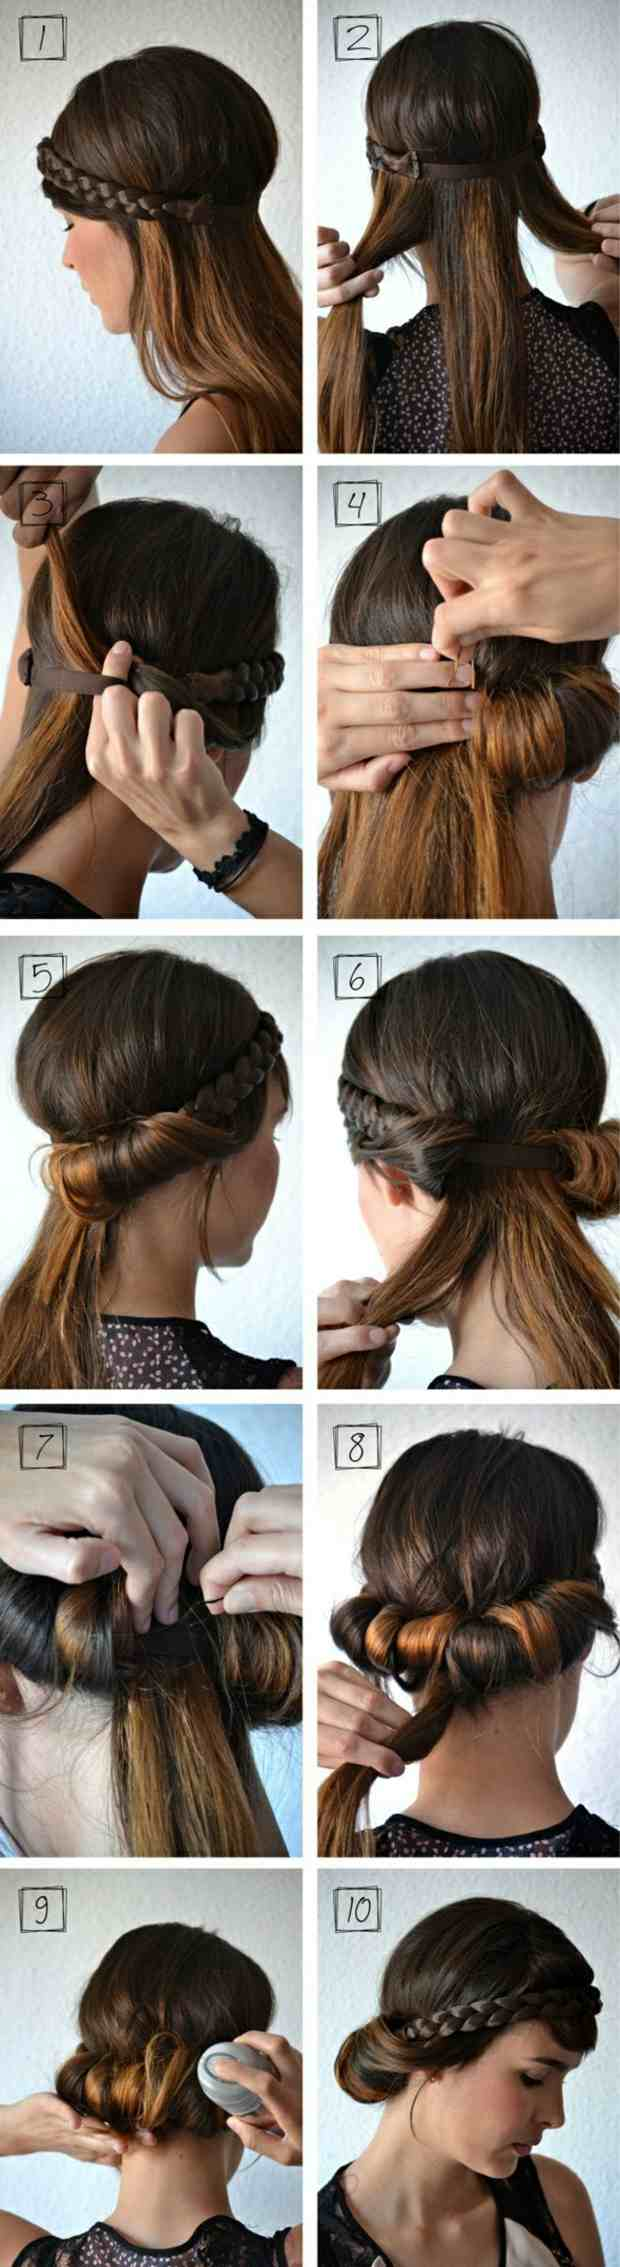 Frisuren Mittellanges Haar Selber Machen Anleitung